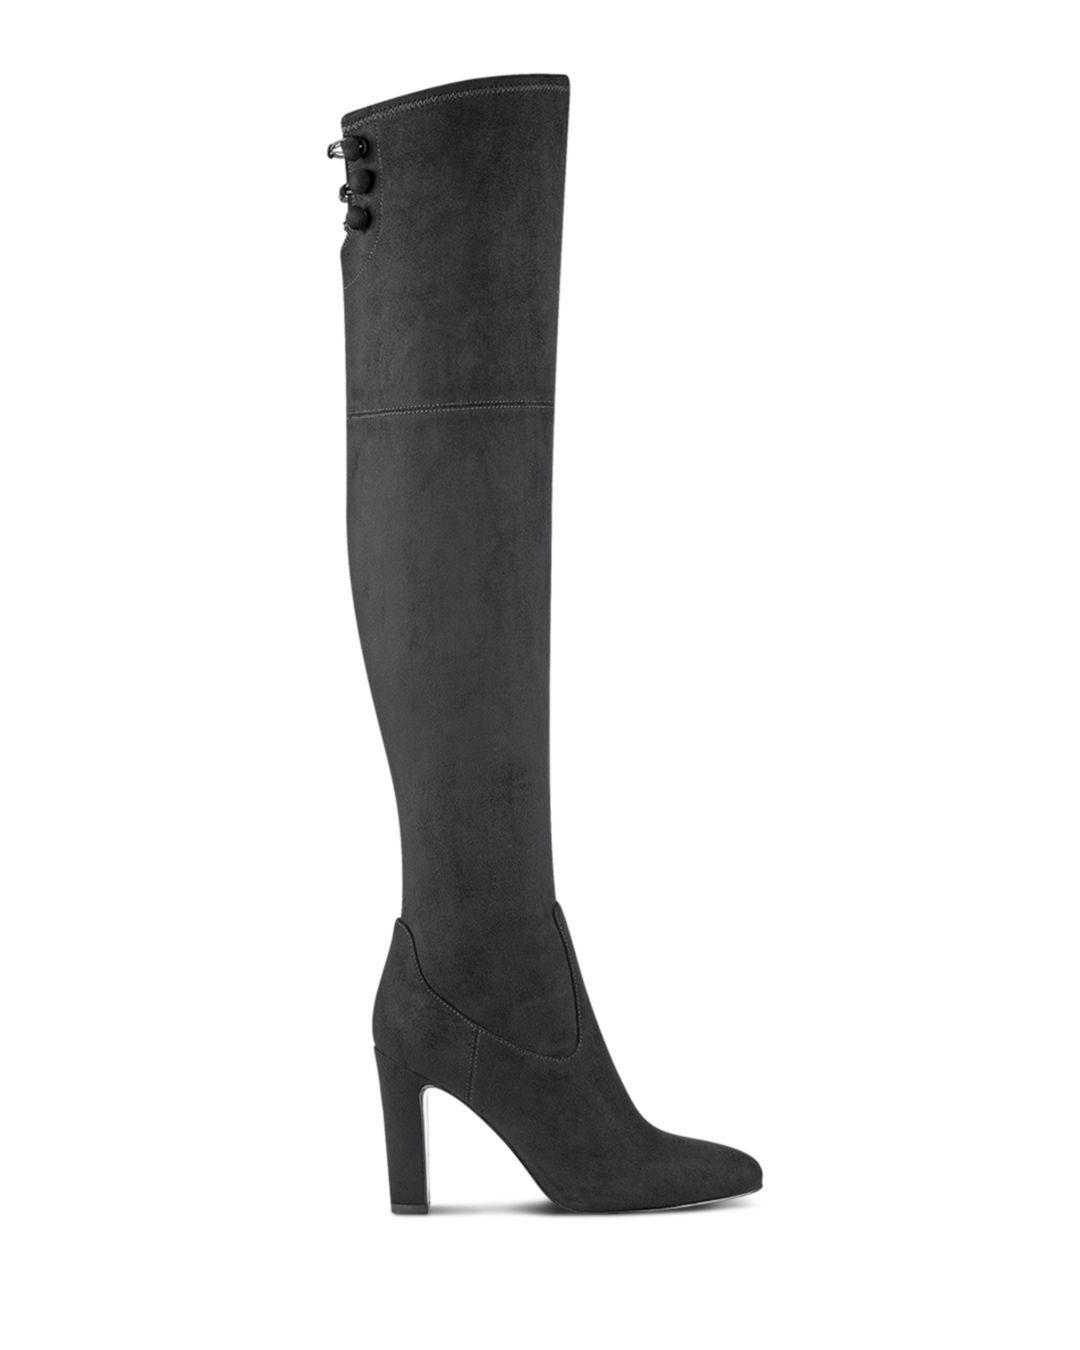 e543e01fbae Lyst - Ivanka Trump Saisha Over-the-knee High-heel Boots in Black